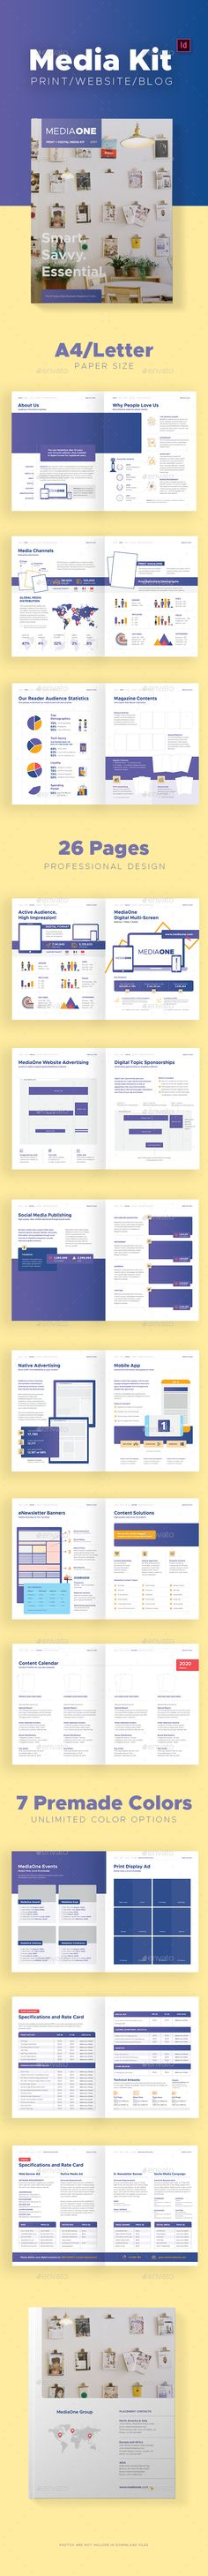 Print and Digital Media Kit Template